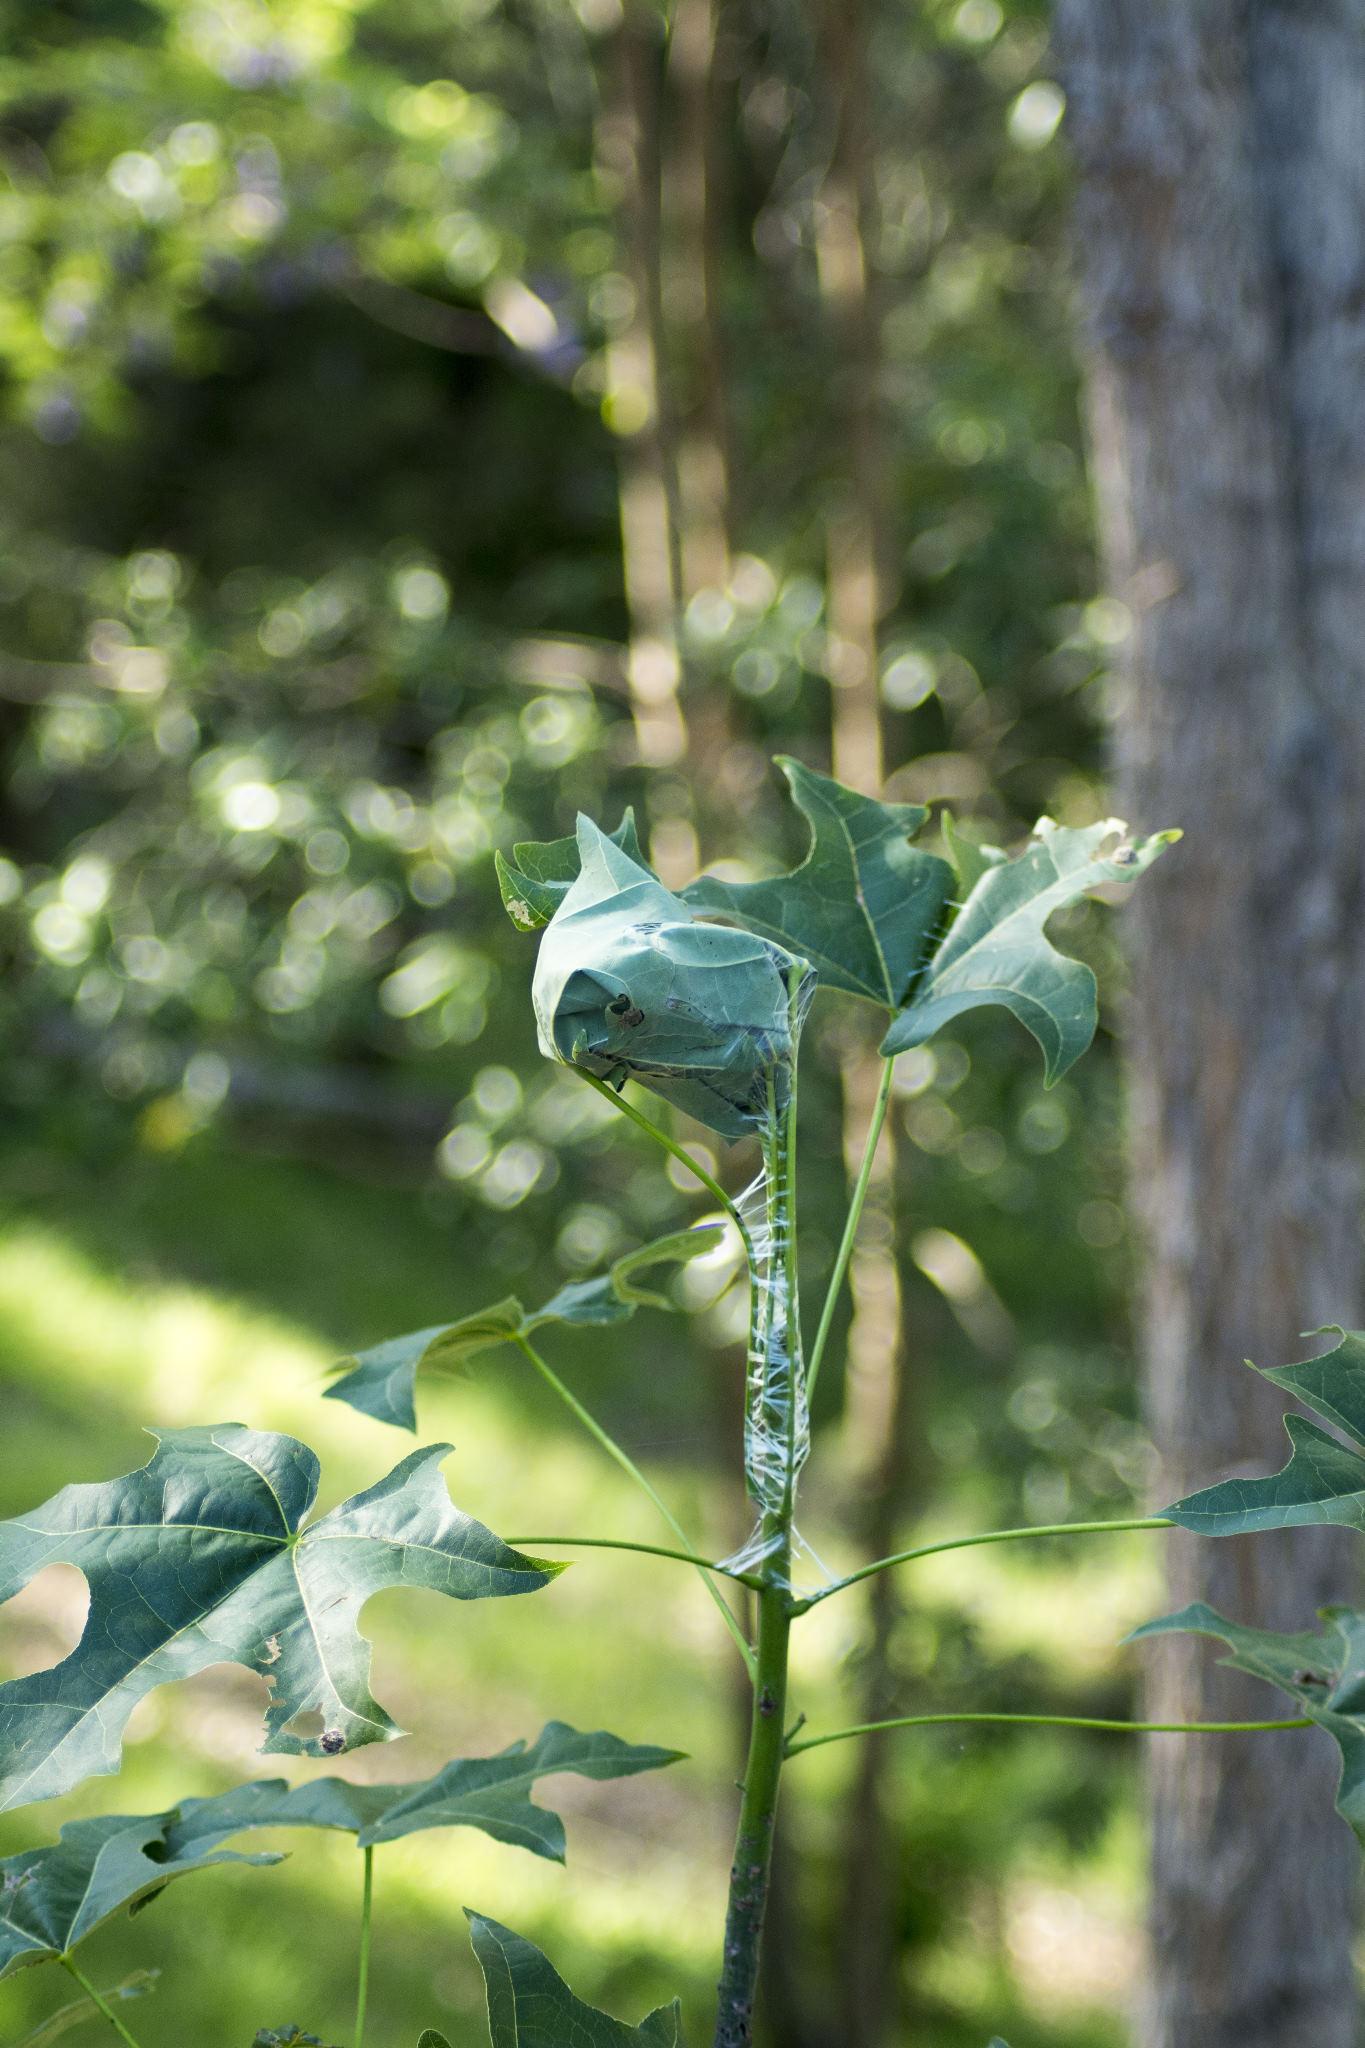 Brachychiton leaf-tying moth infestation on a Flame Tree